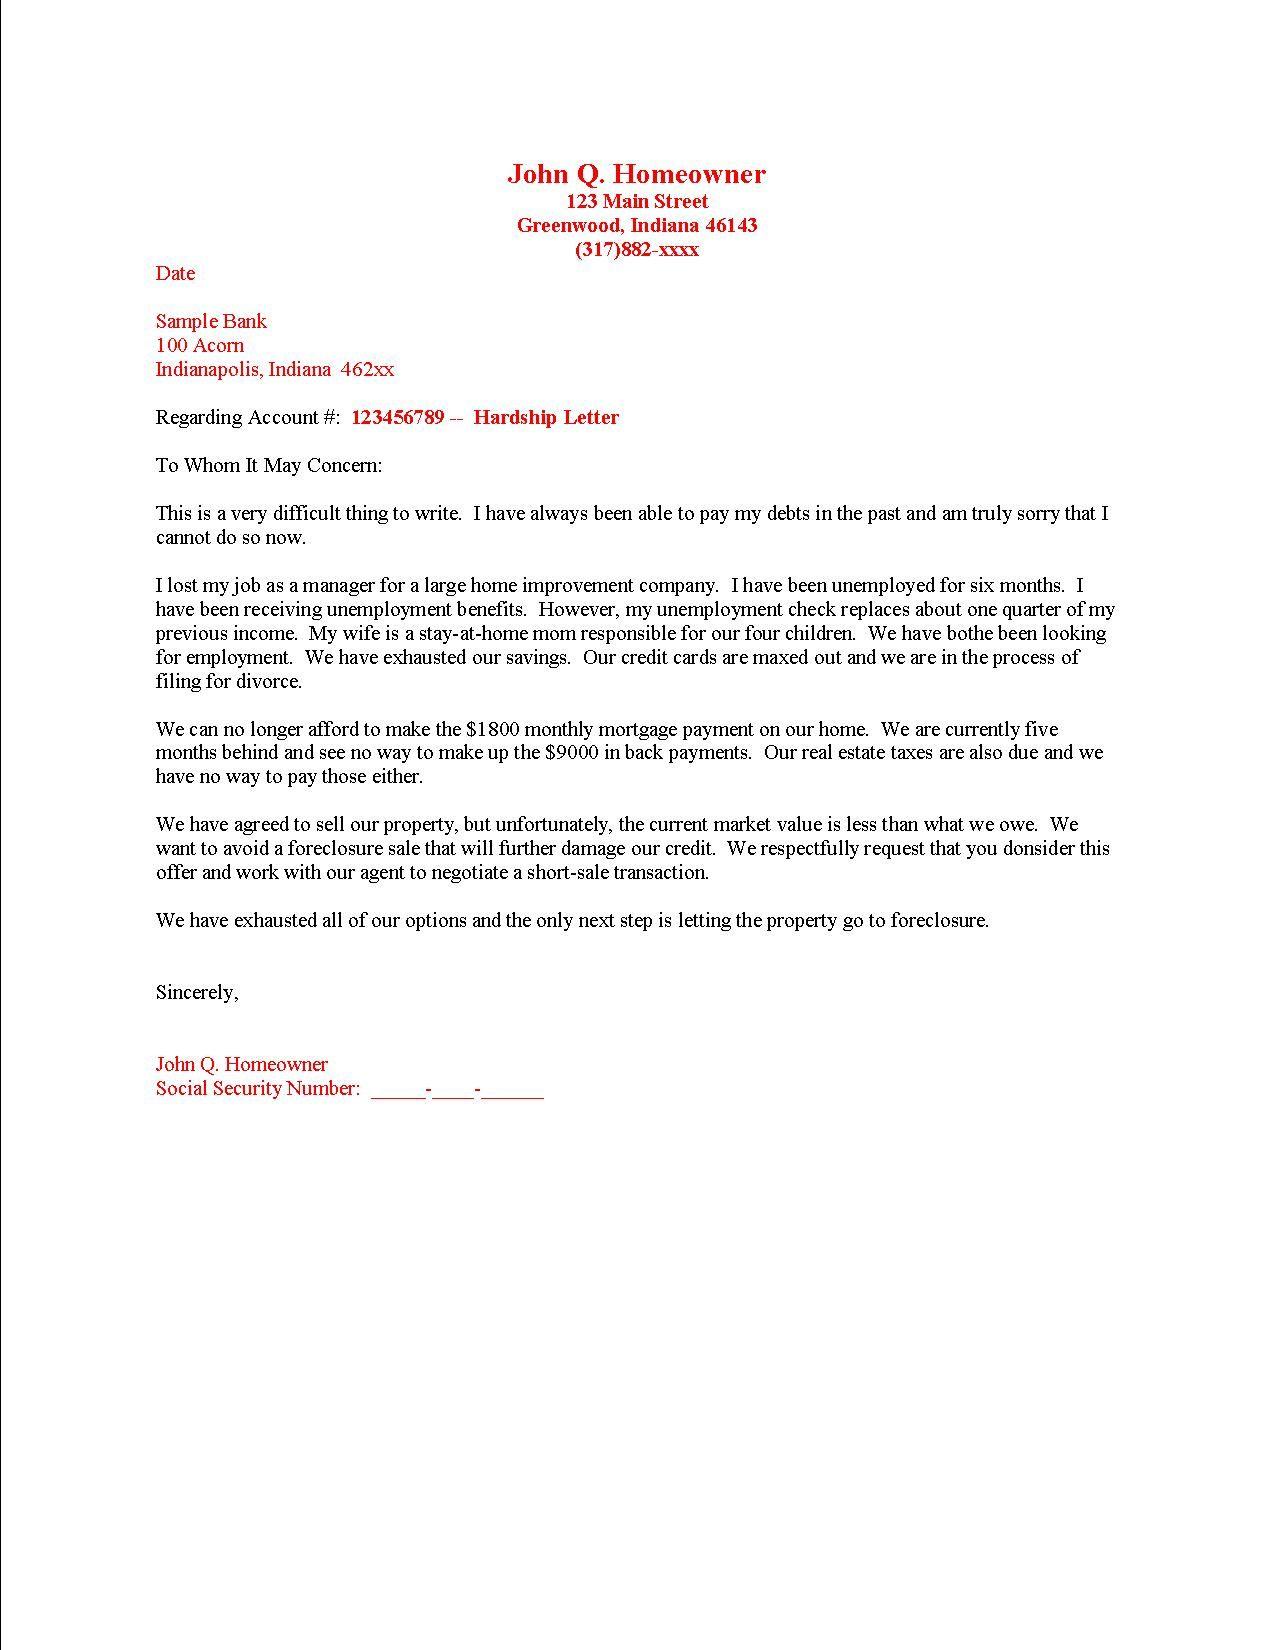 Economic Hardship Letter For International Students Sample from i.pinimg.com